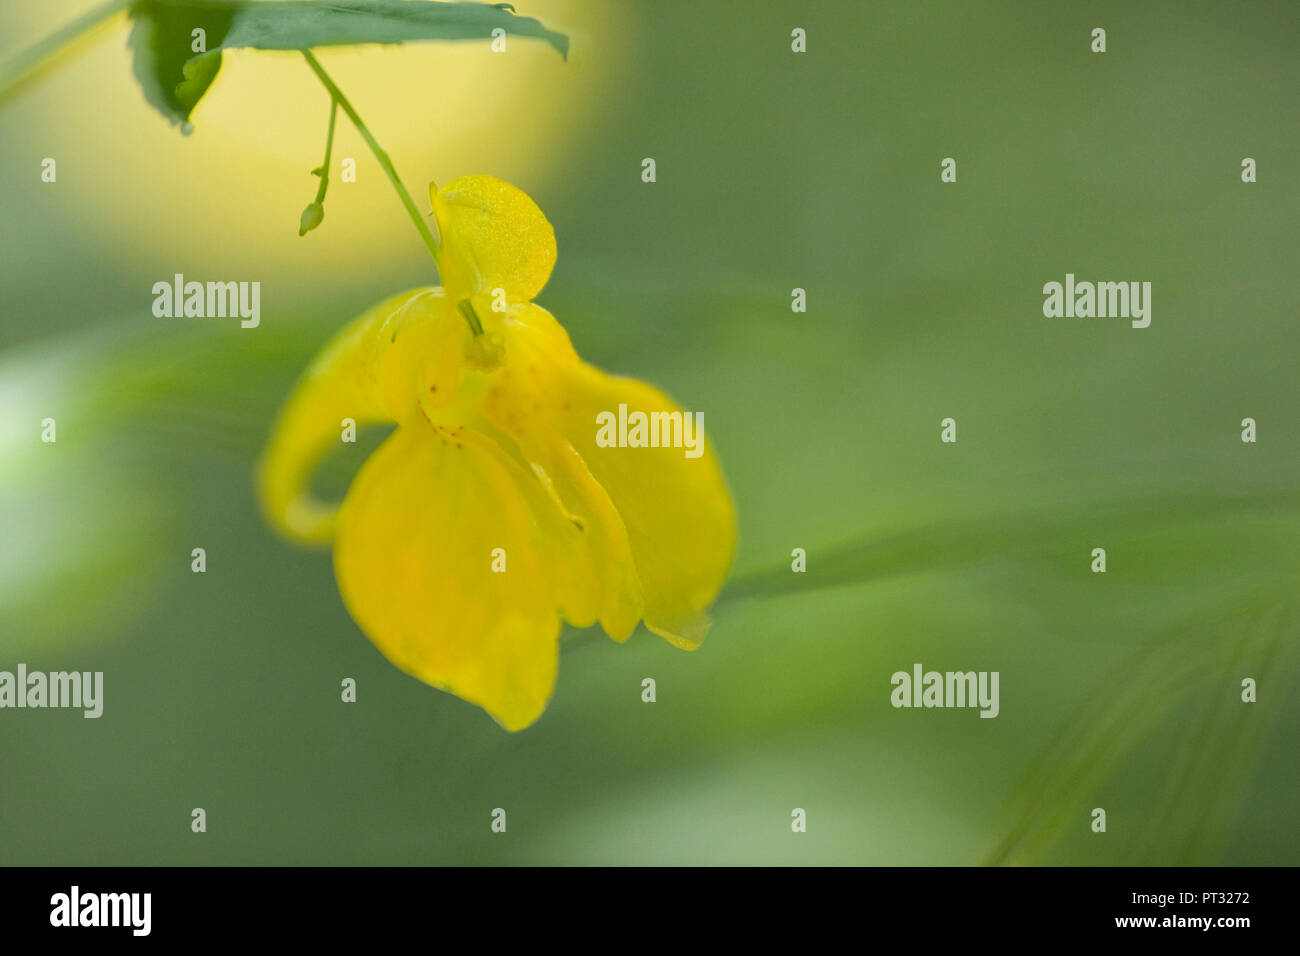 Flowering yellow balsam, Impatiens noli-tangere, close-up Stock Photo